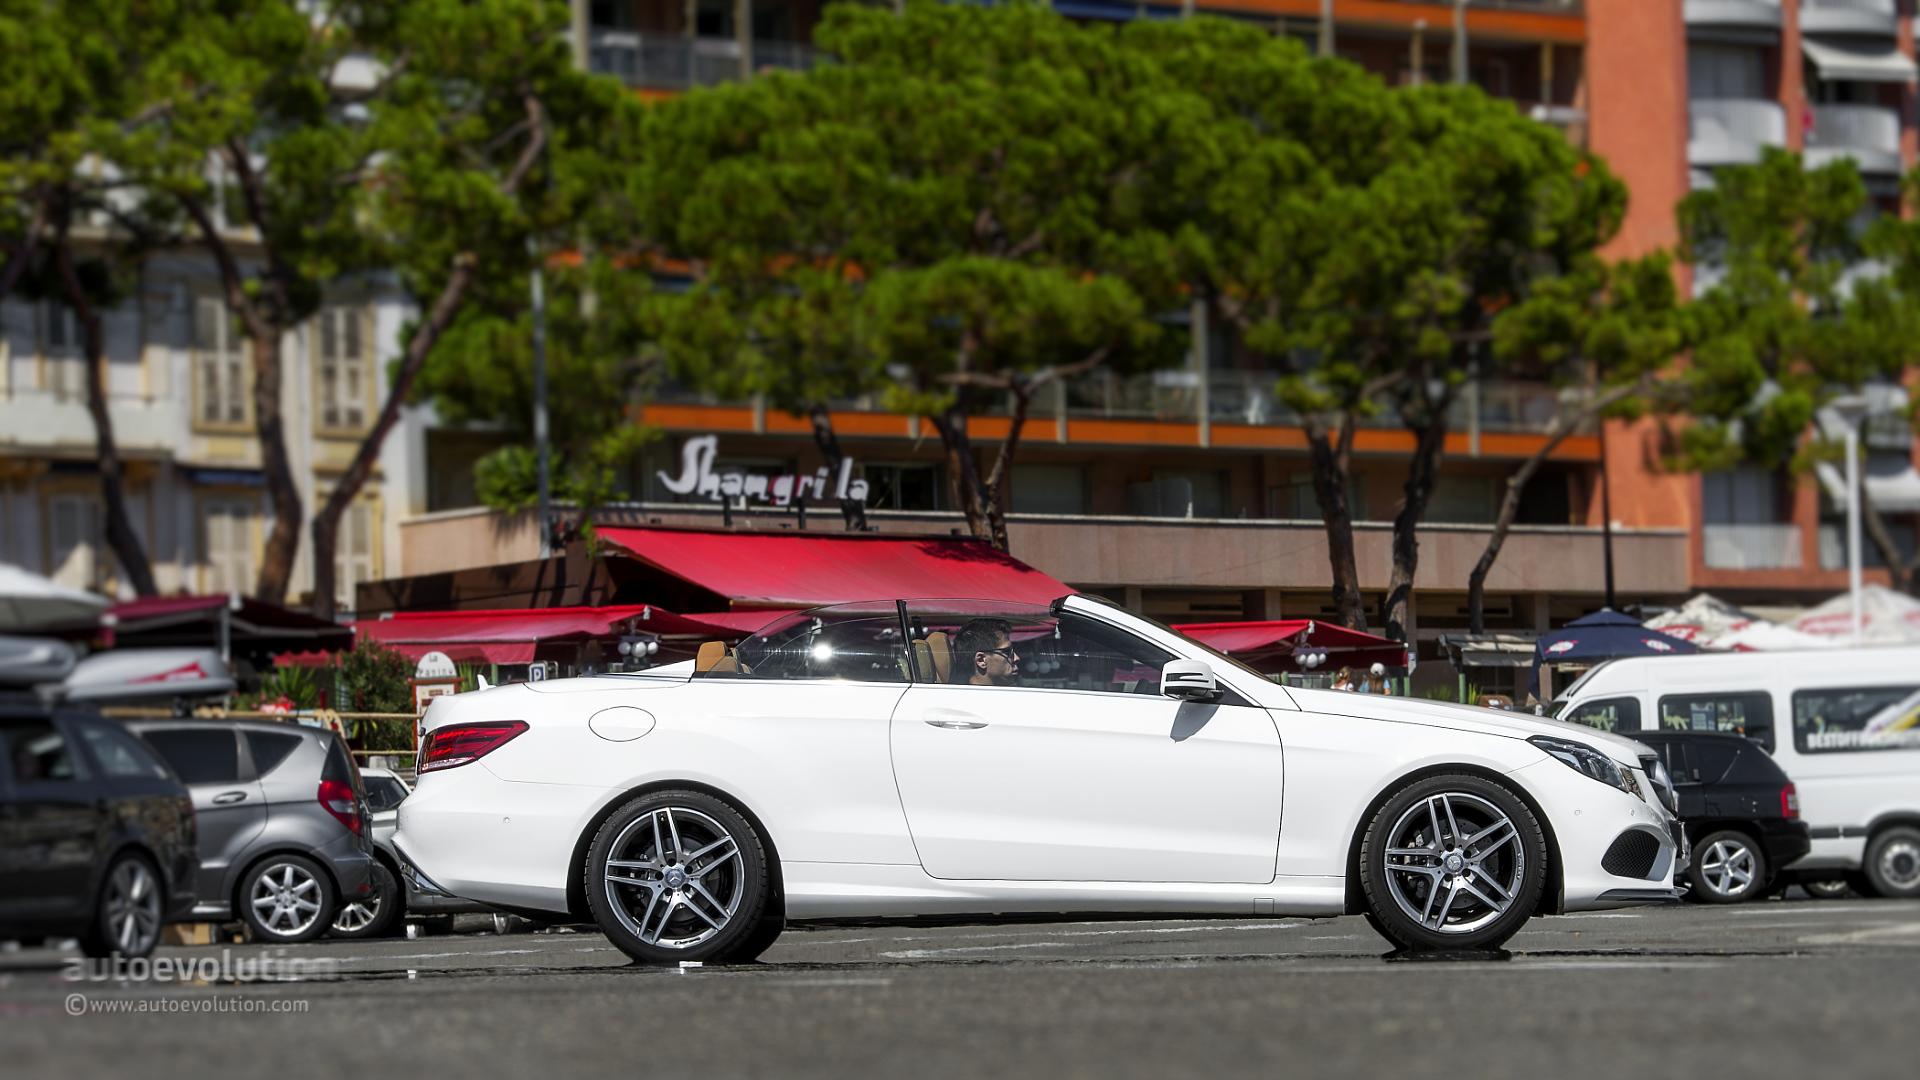 2014 mercedes benz e class cabriolet original pictures for Mercedes benz convertible tops